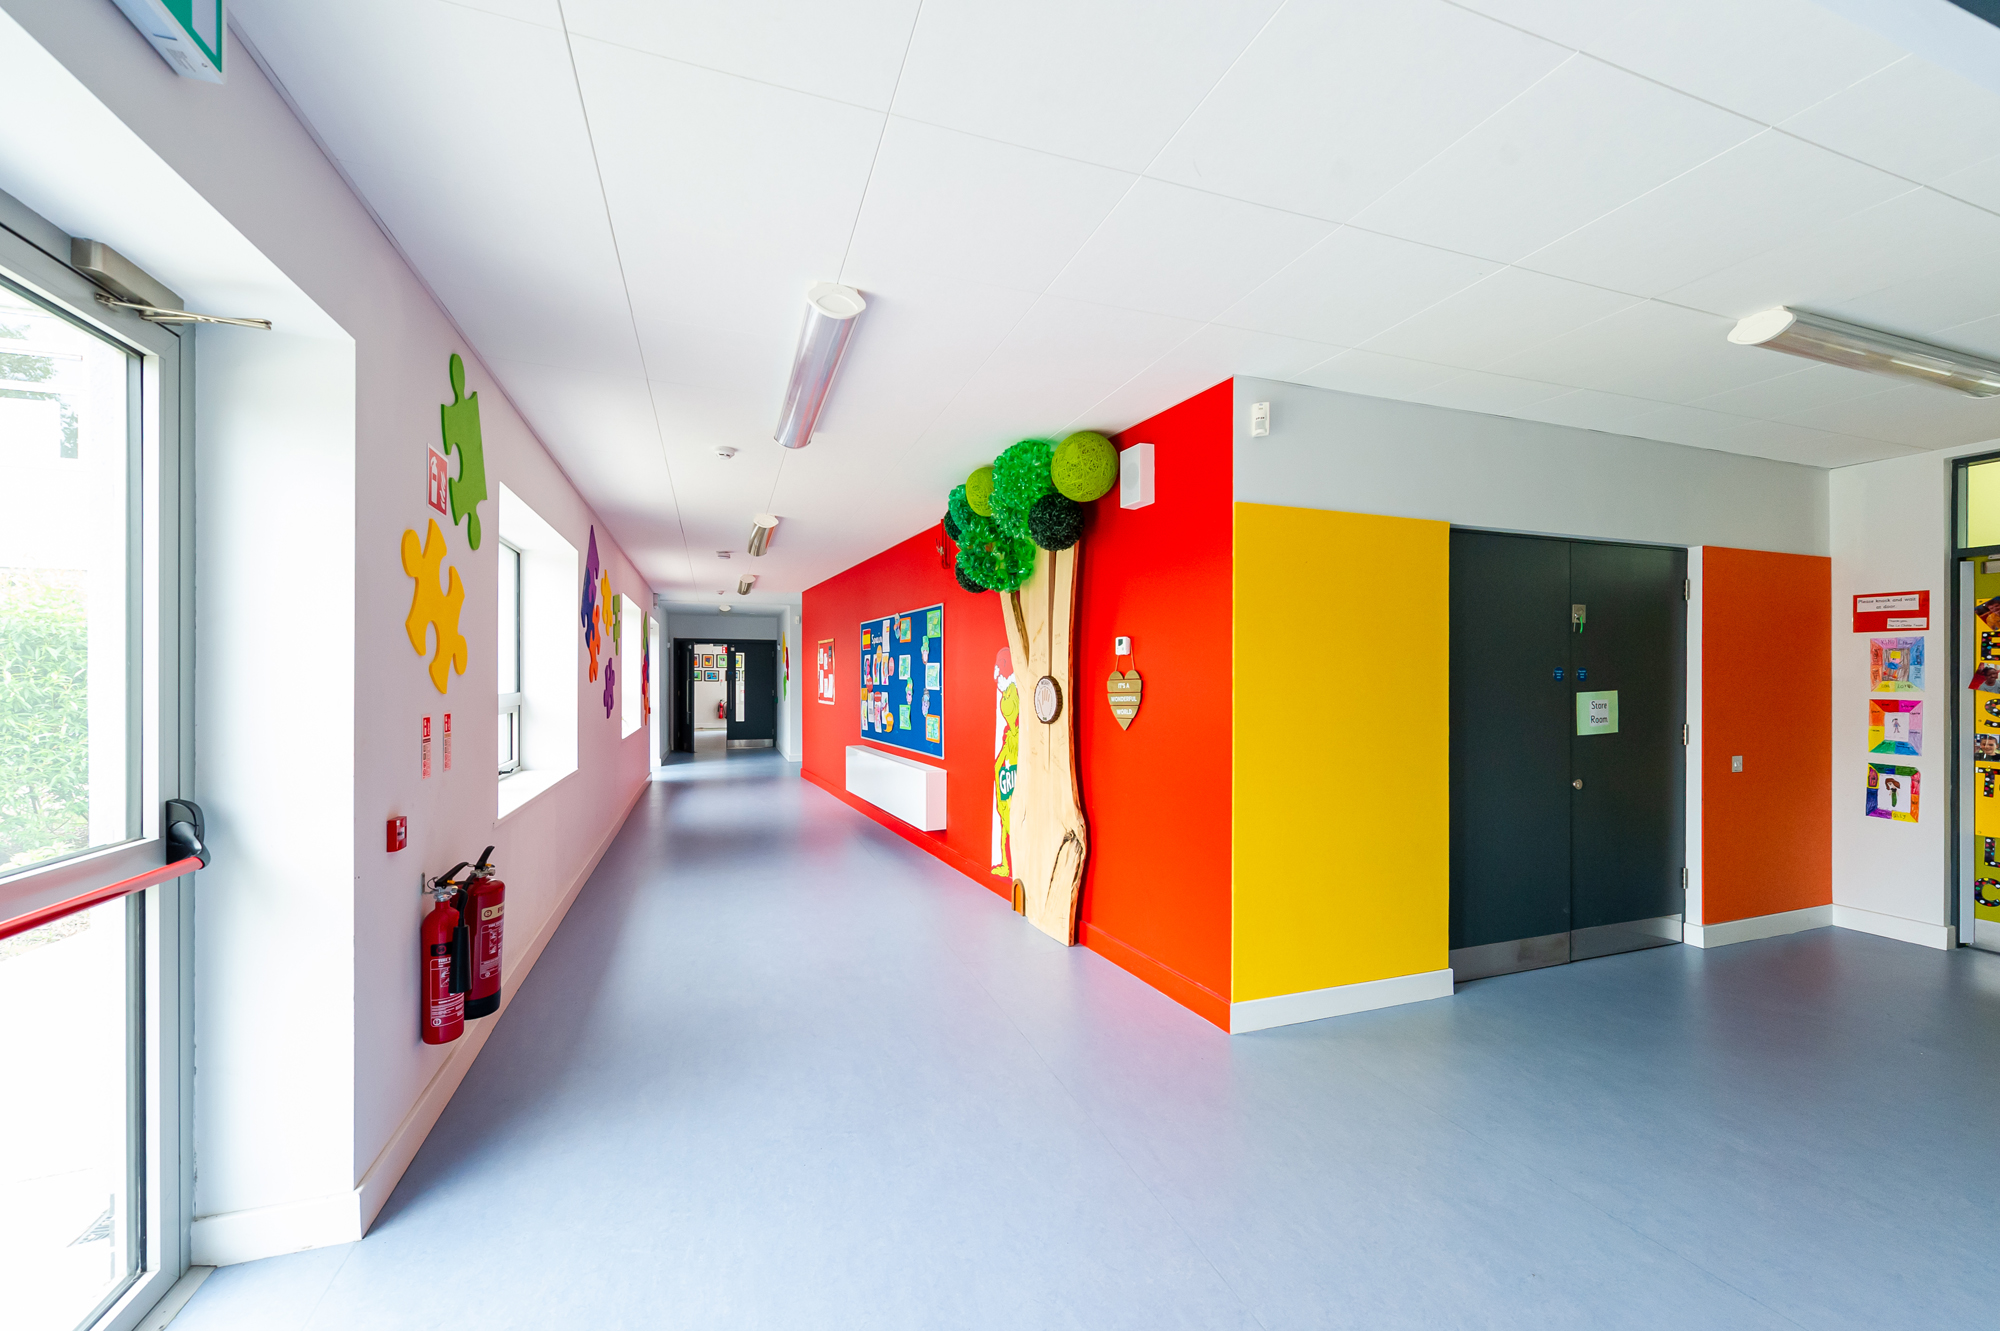 View of stimulating corridor